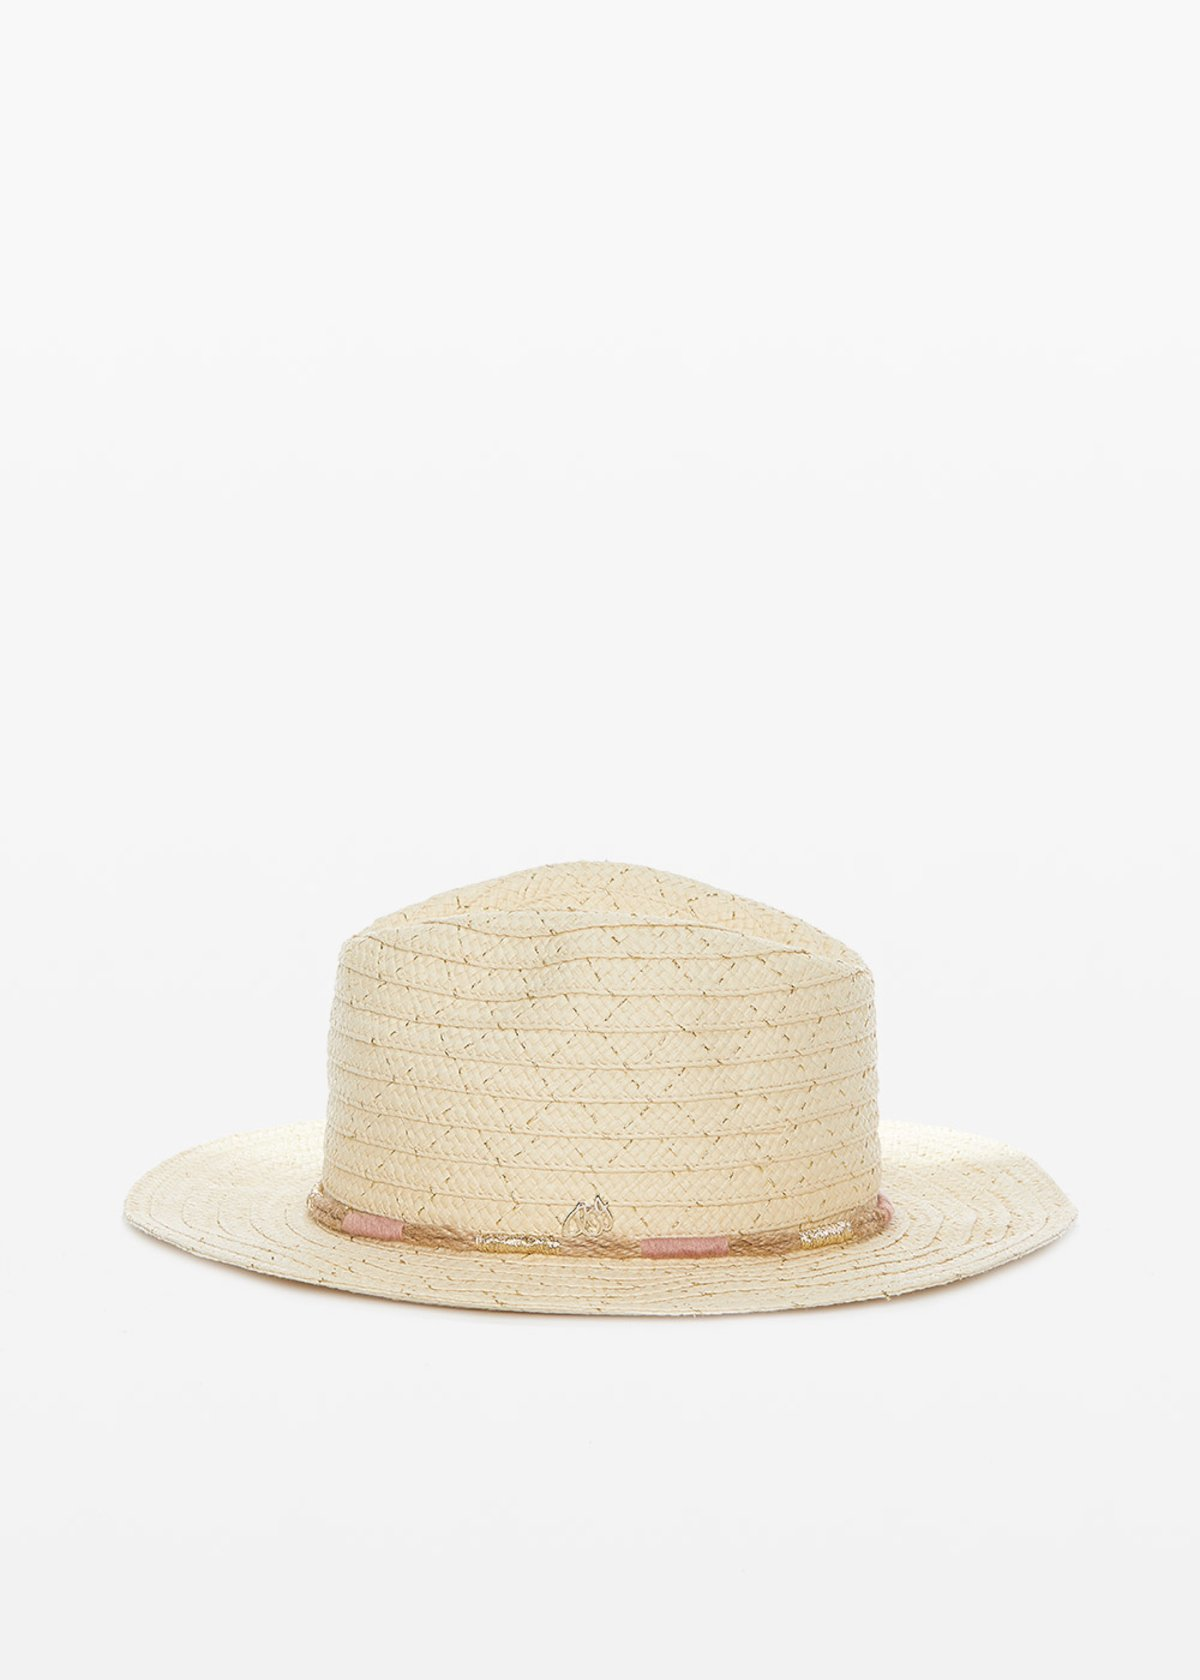 Ciber straw hat with drawstring detail - Light Beige /       Gold Fantasia - Woman